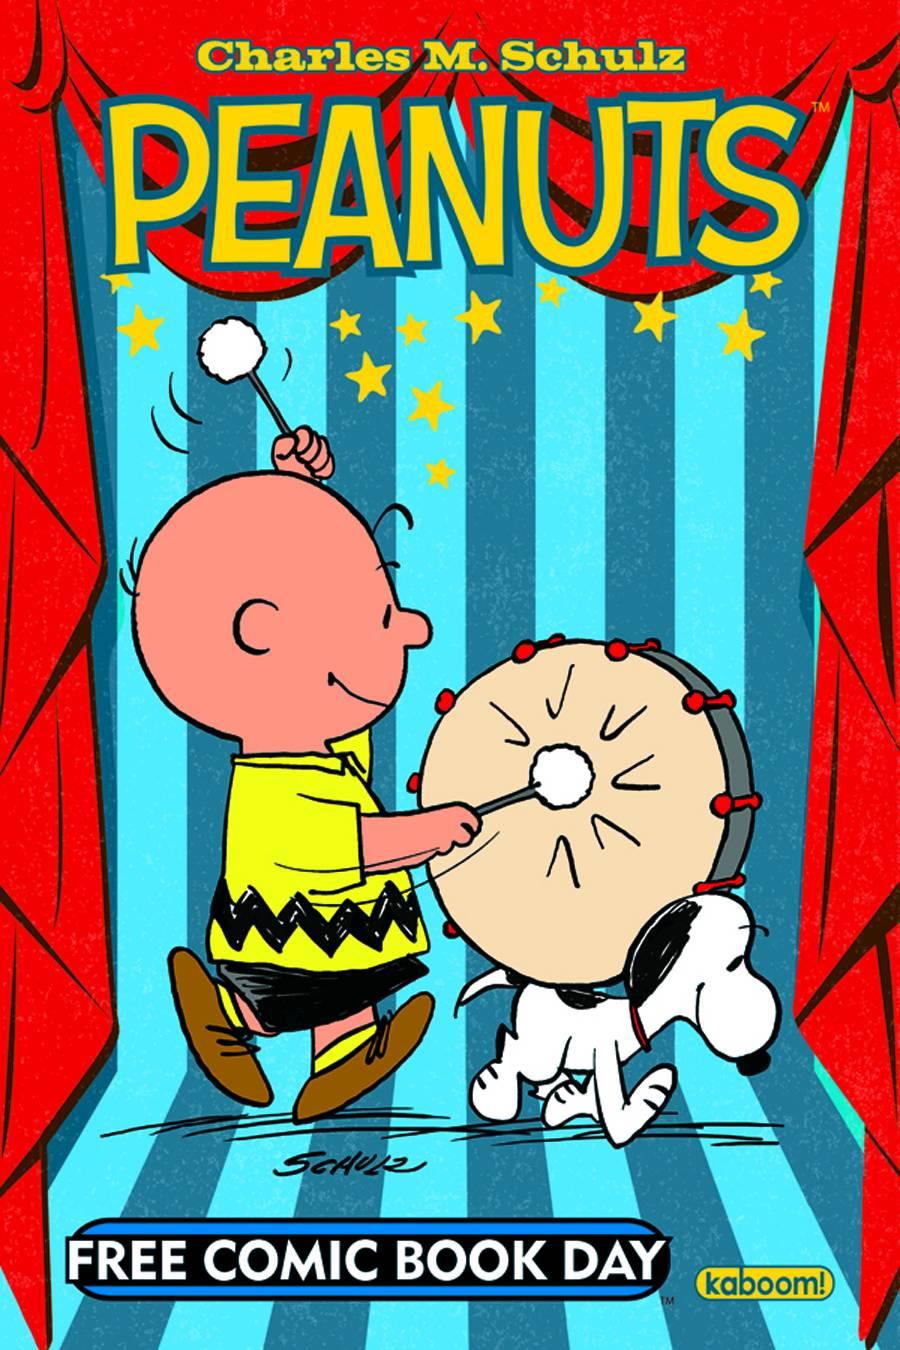 comics peanuts adventure comic books flipbook entertainment fcbd preview worst boom